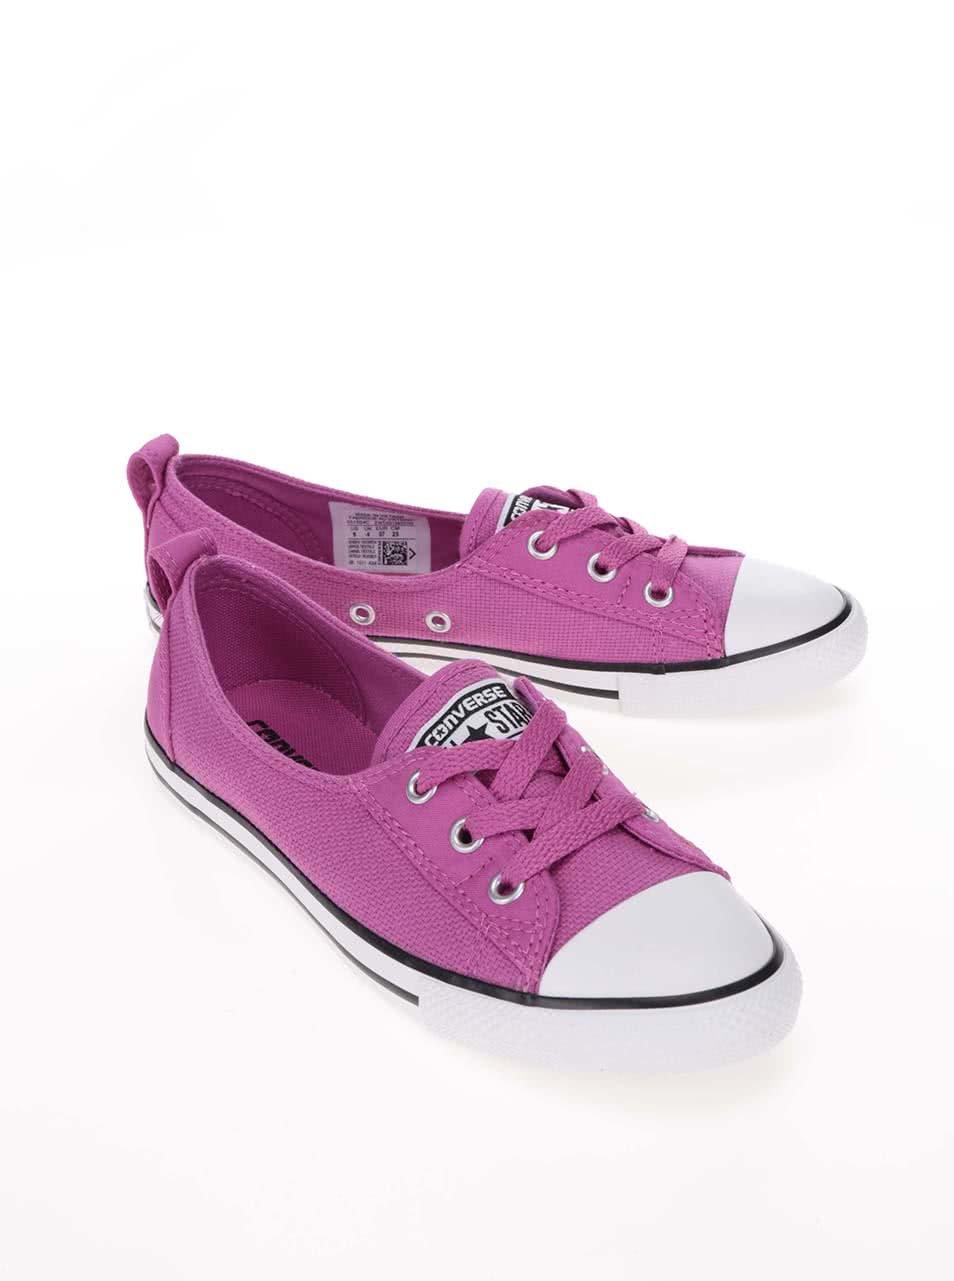 Tmavě růžové dámské tenisky Converse Chuck Taylor All Star Ballet Lace ... c7a4c2c7da4